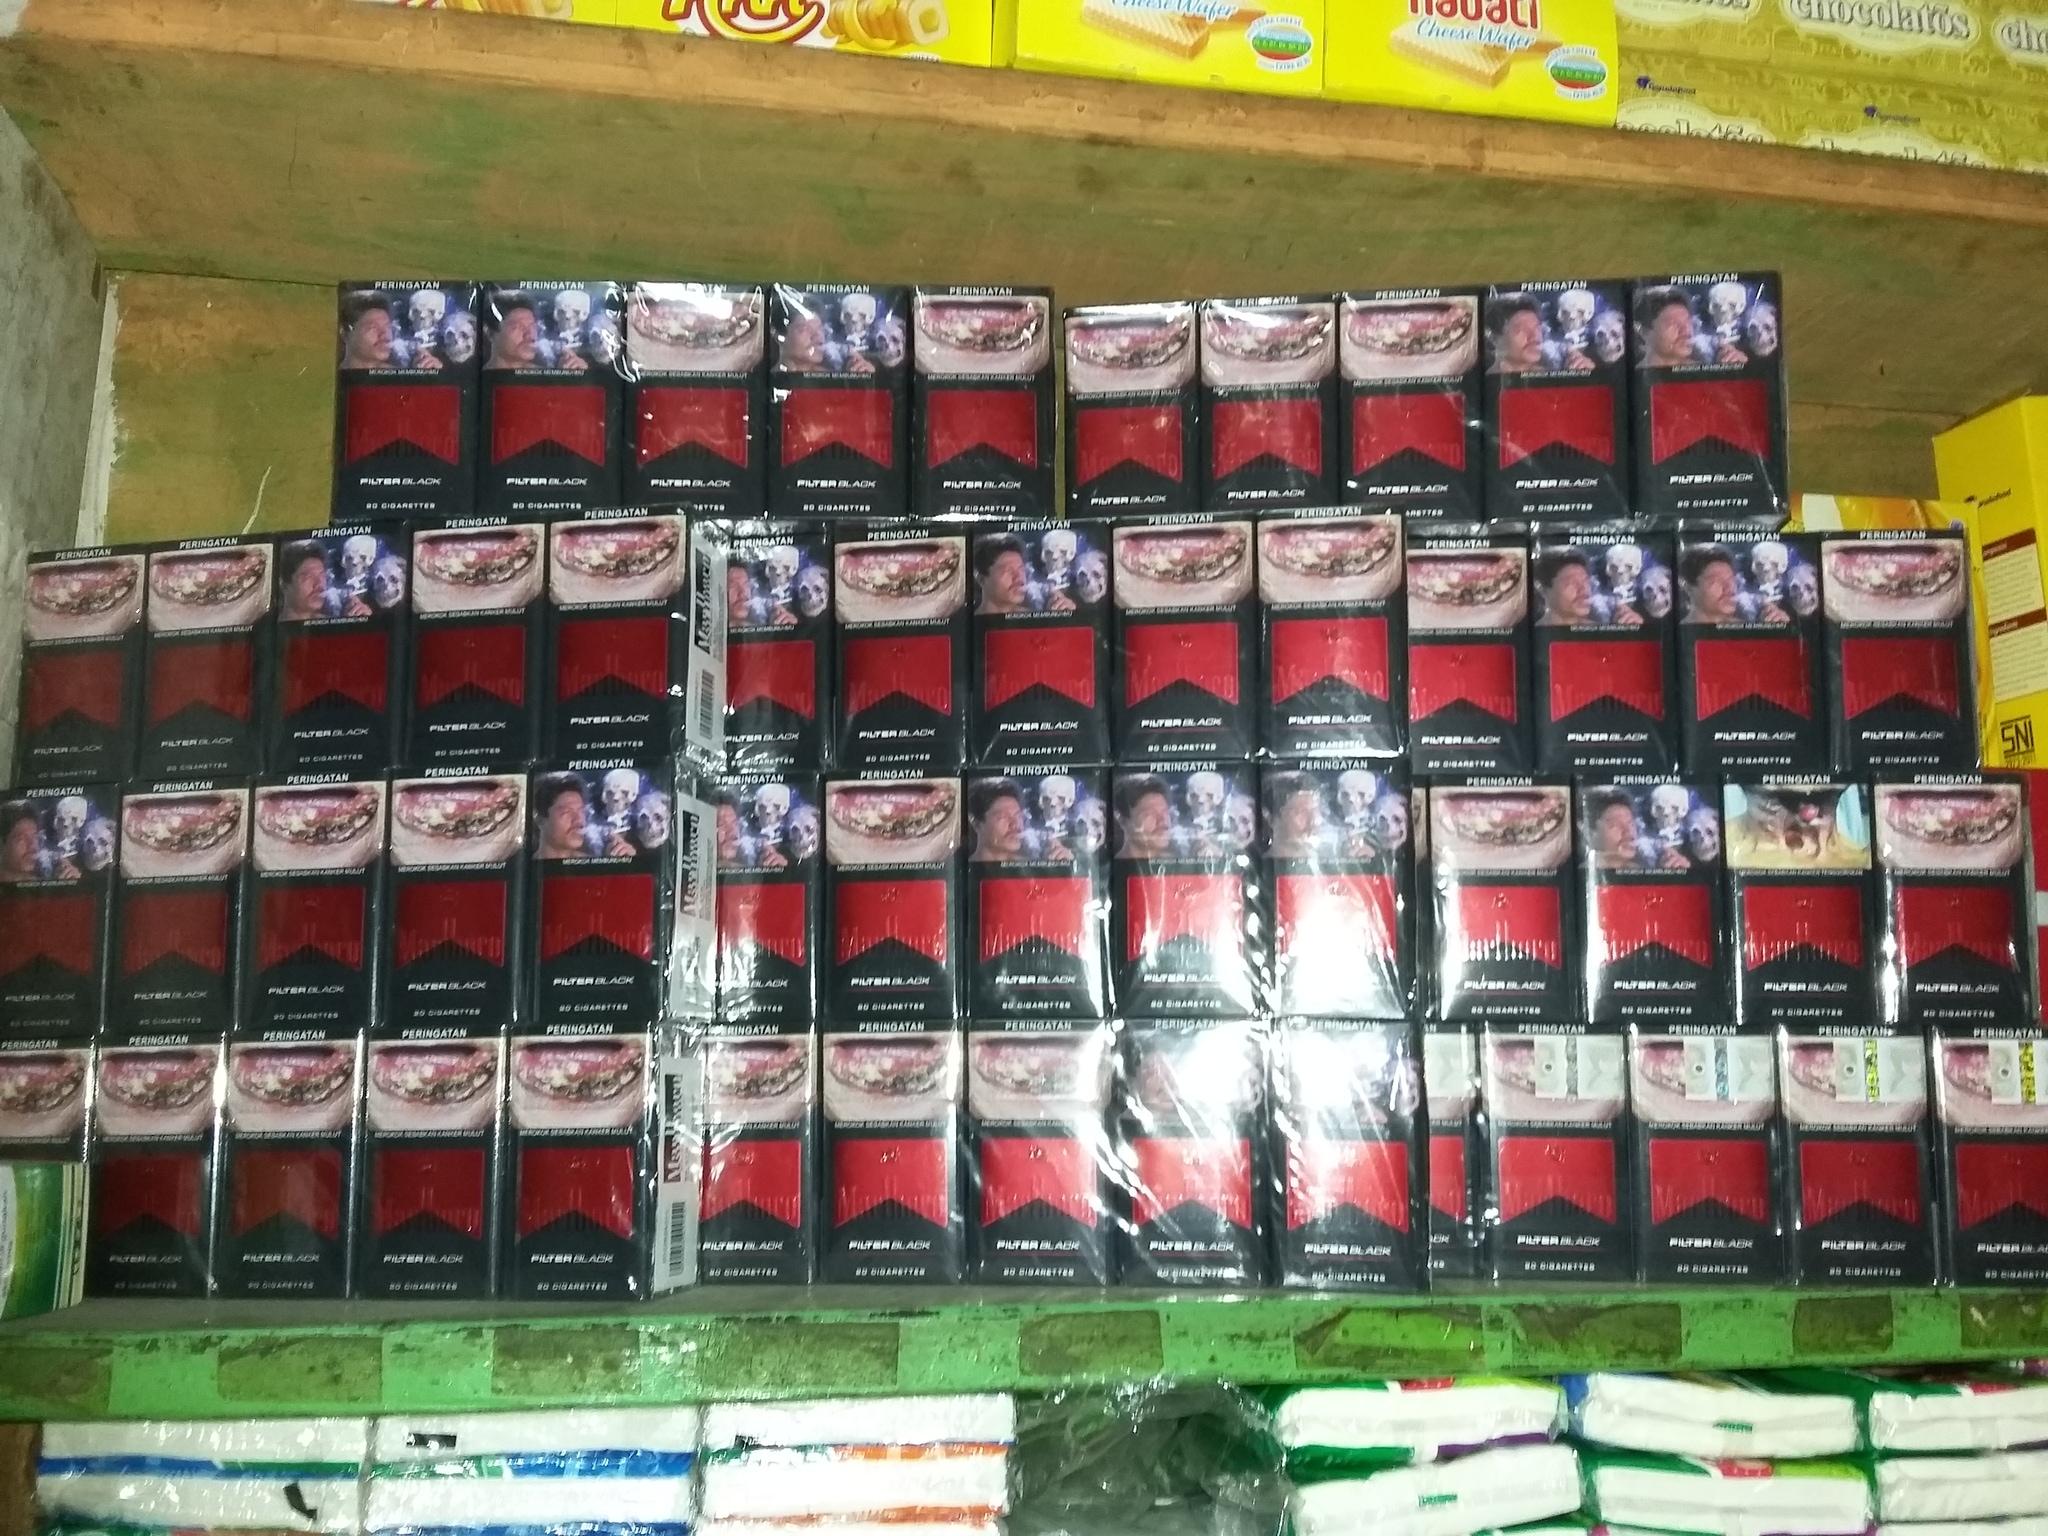 Jual Rokok Marlboro Filter Black Toko Aa Tokopedia 20